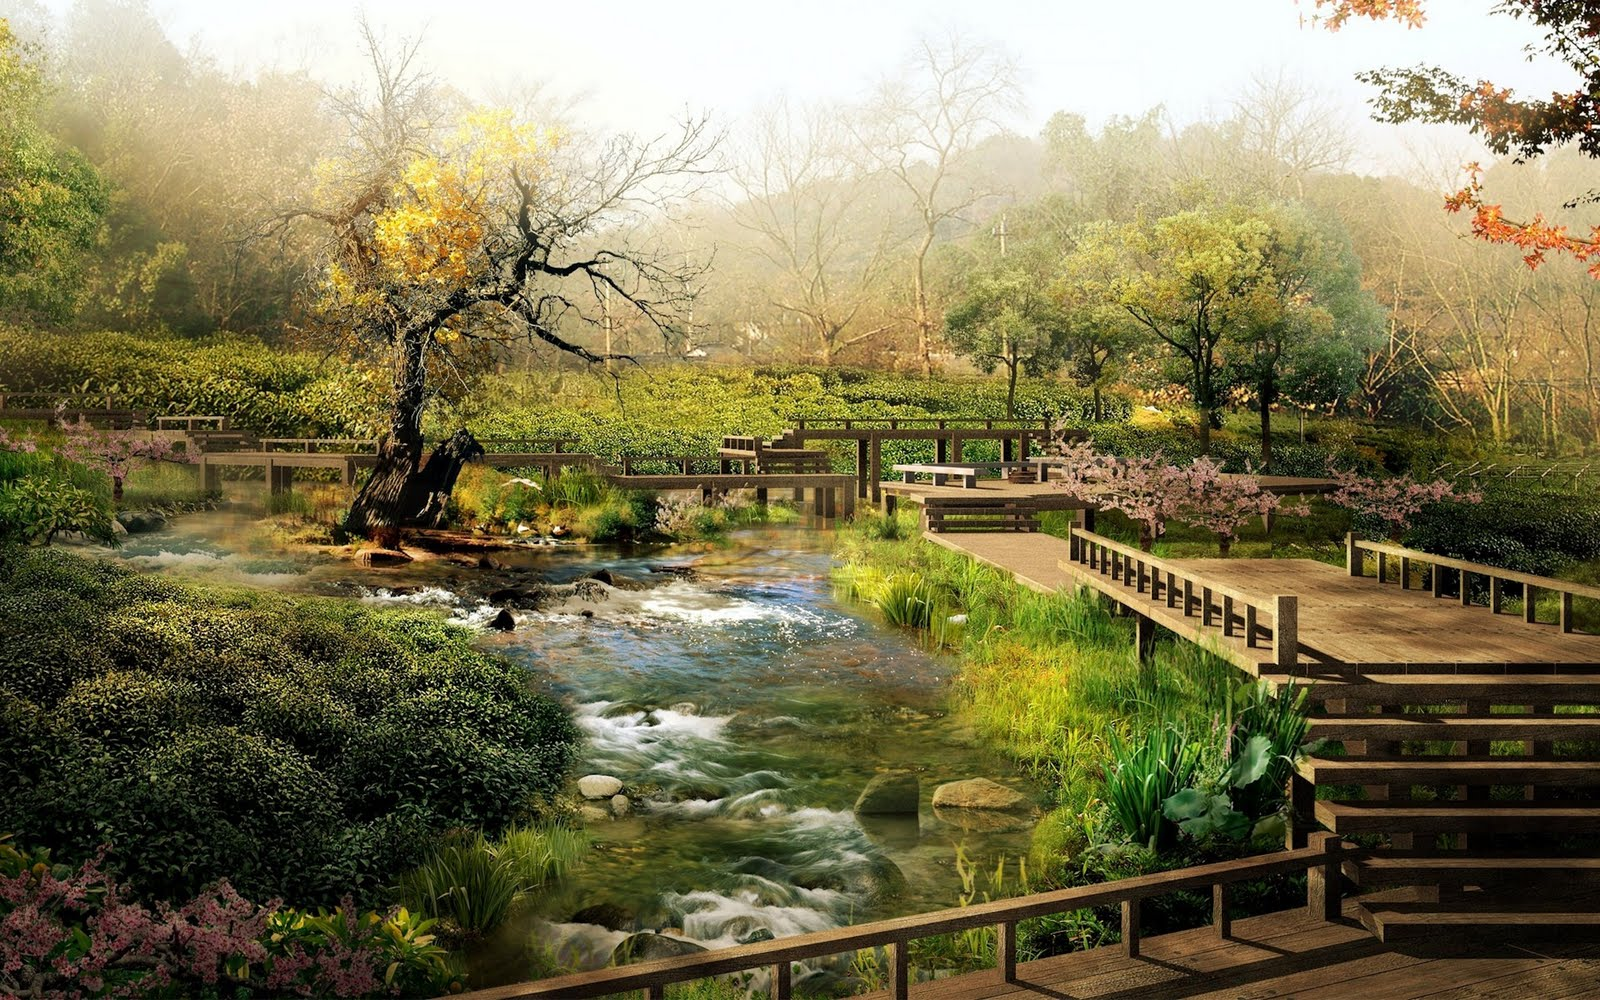 chinese garden wallpaper in hd - photo #23